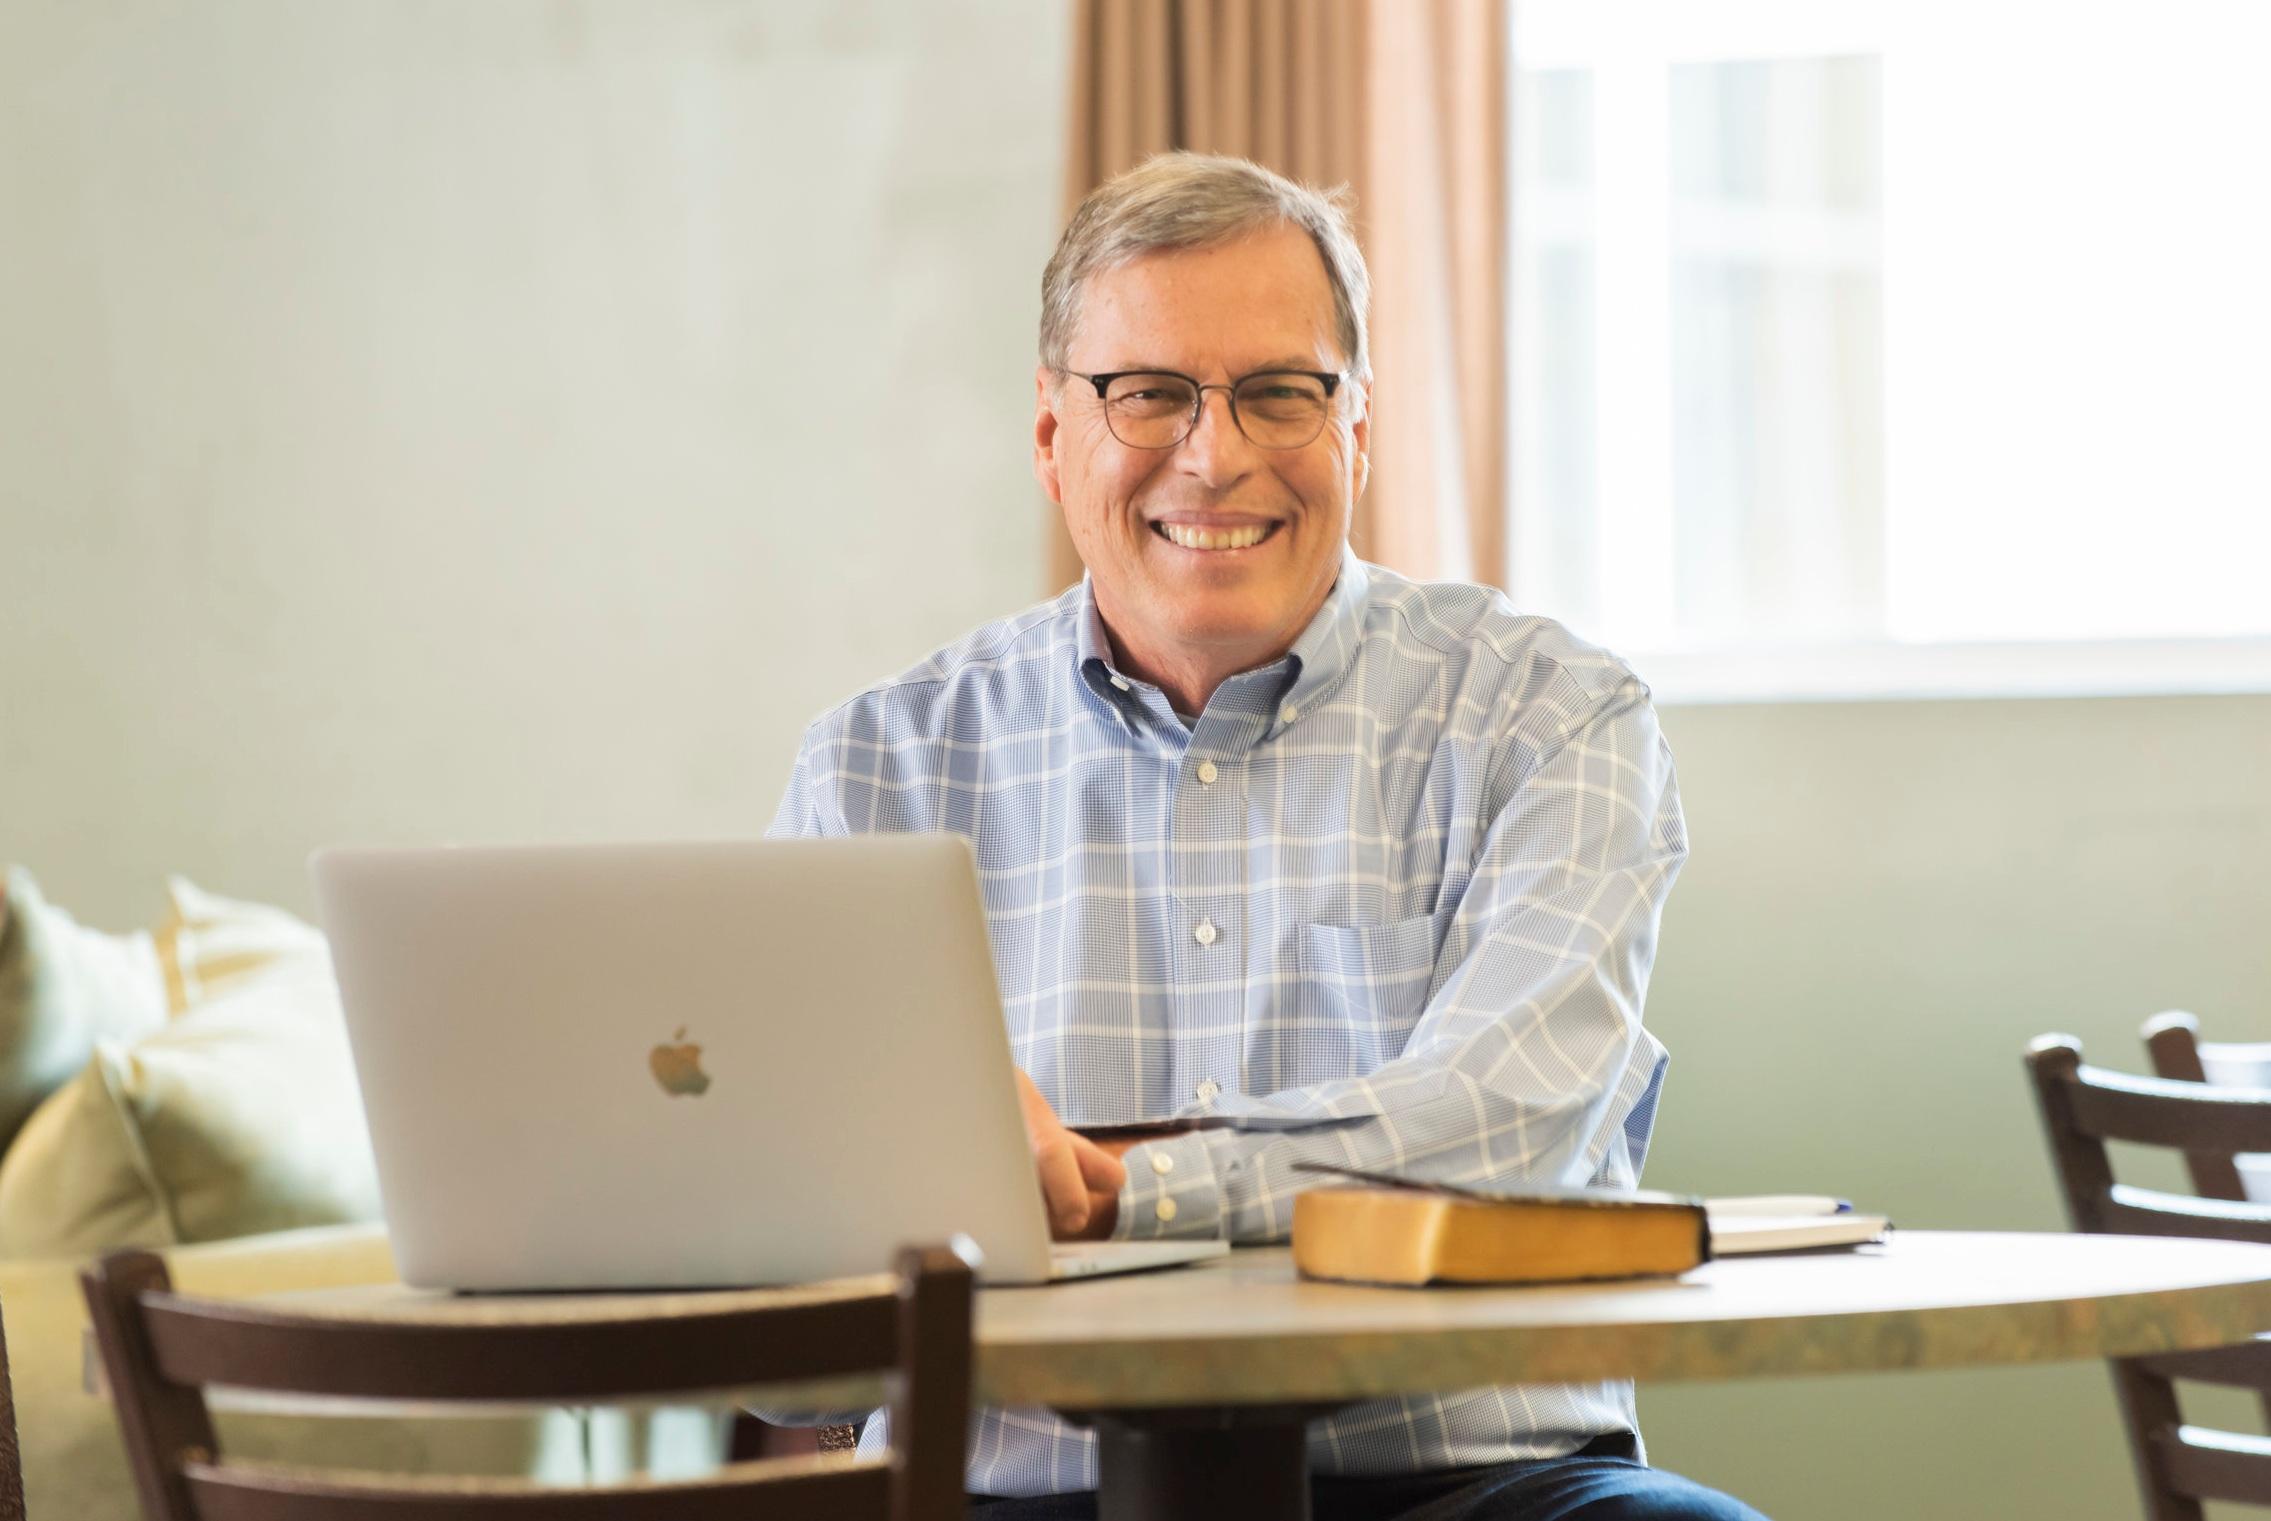 Dave DeSelm offers online resources for pastors.